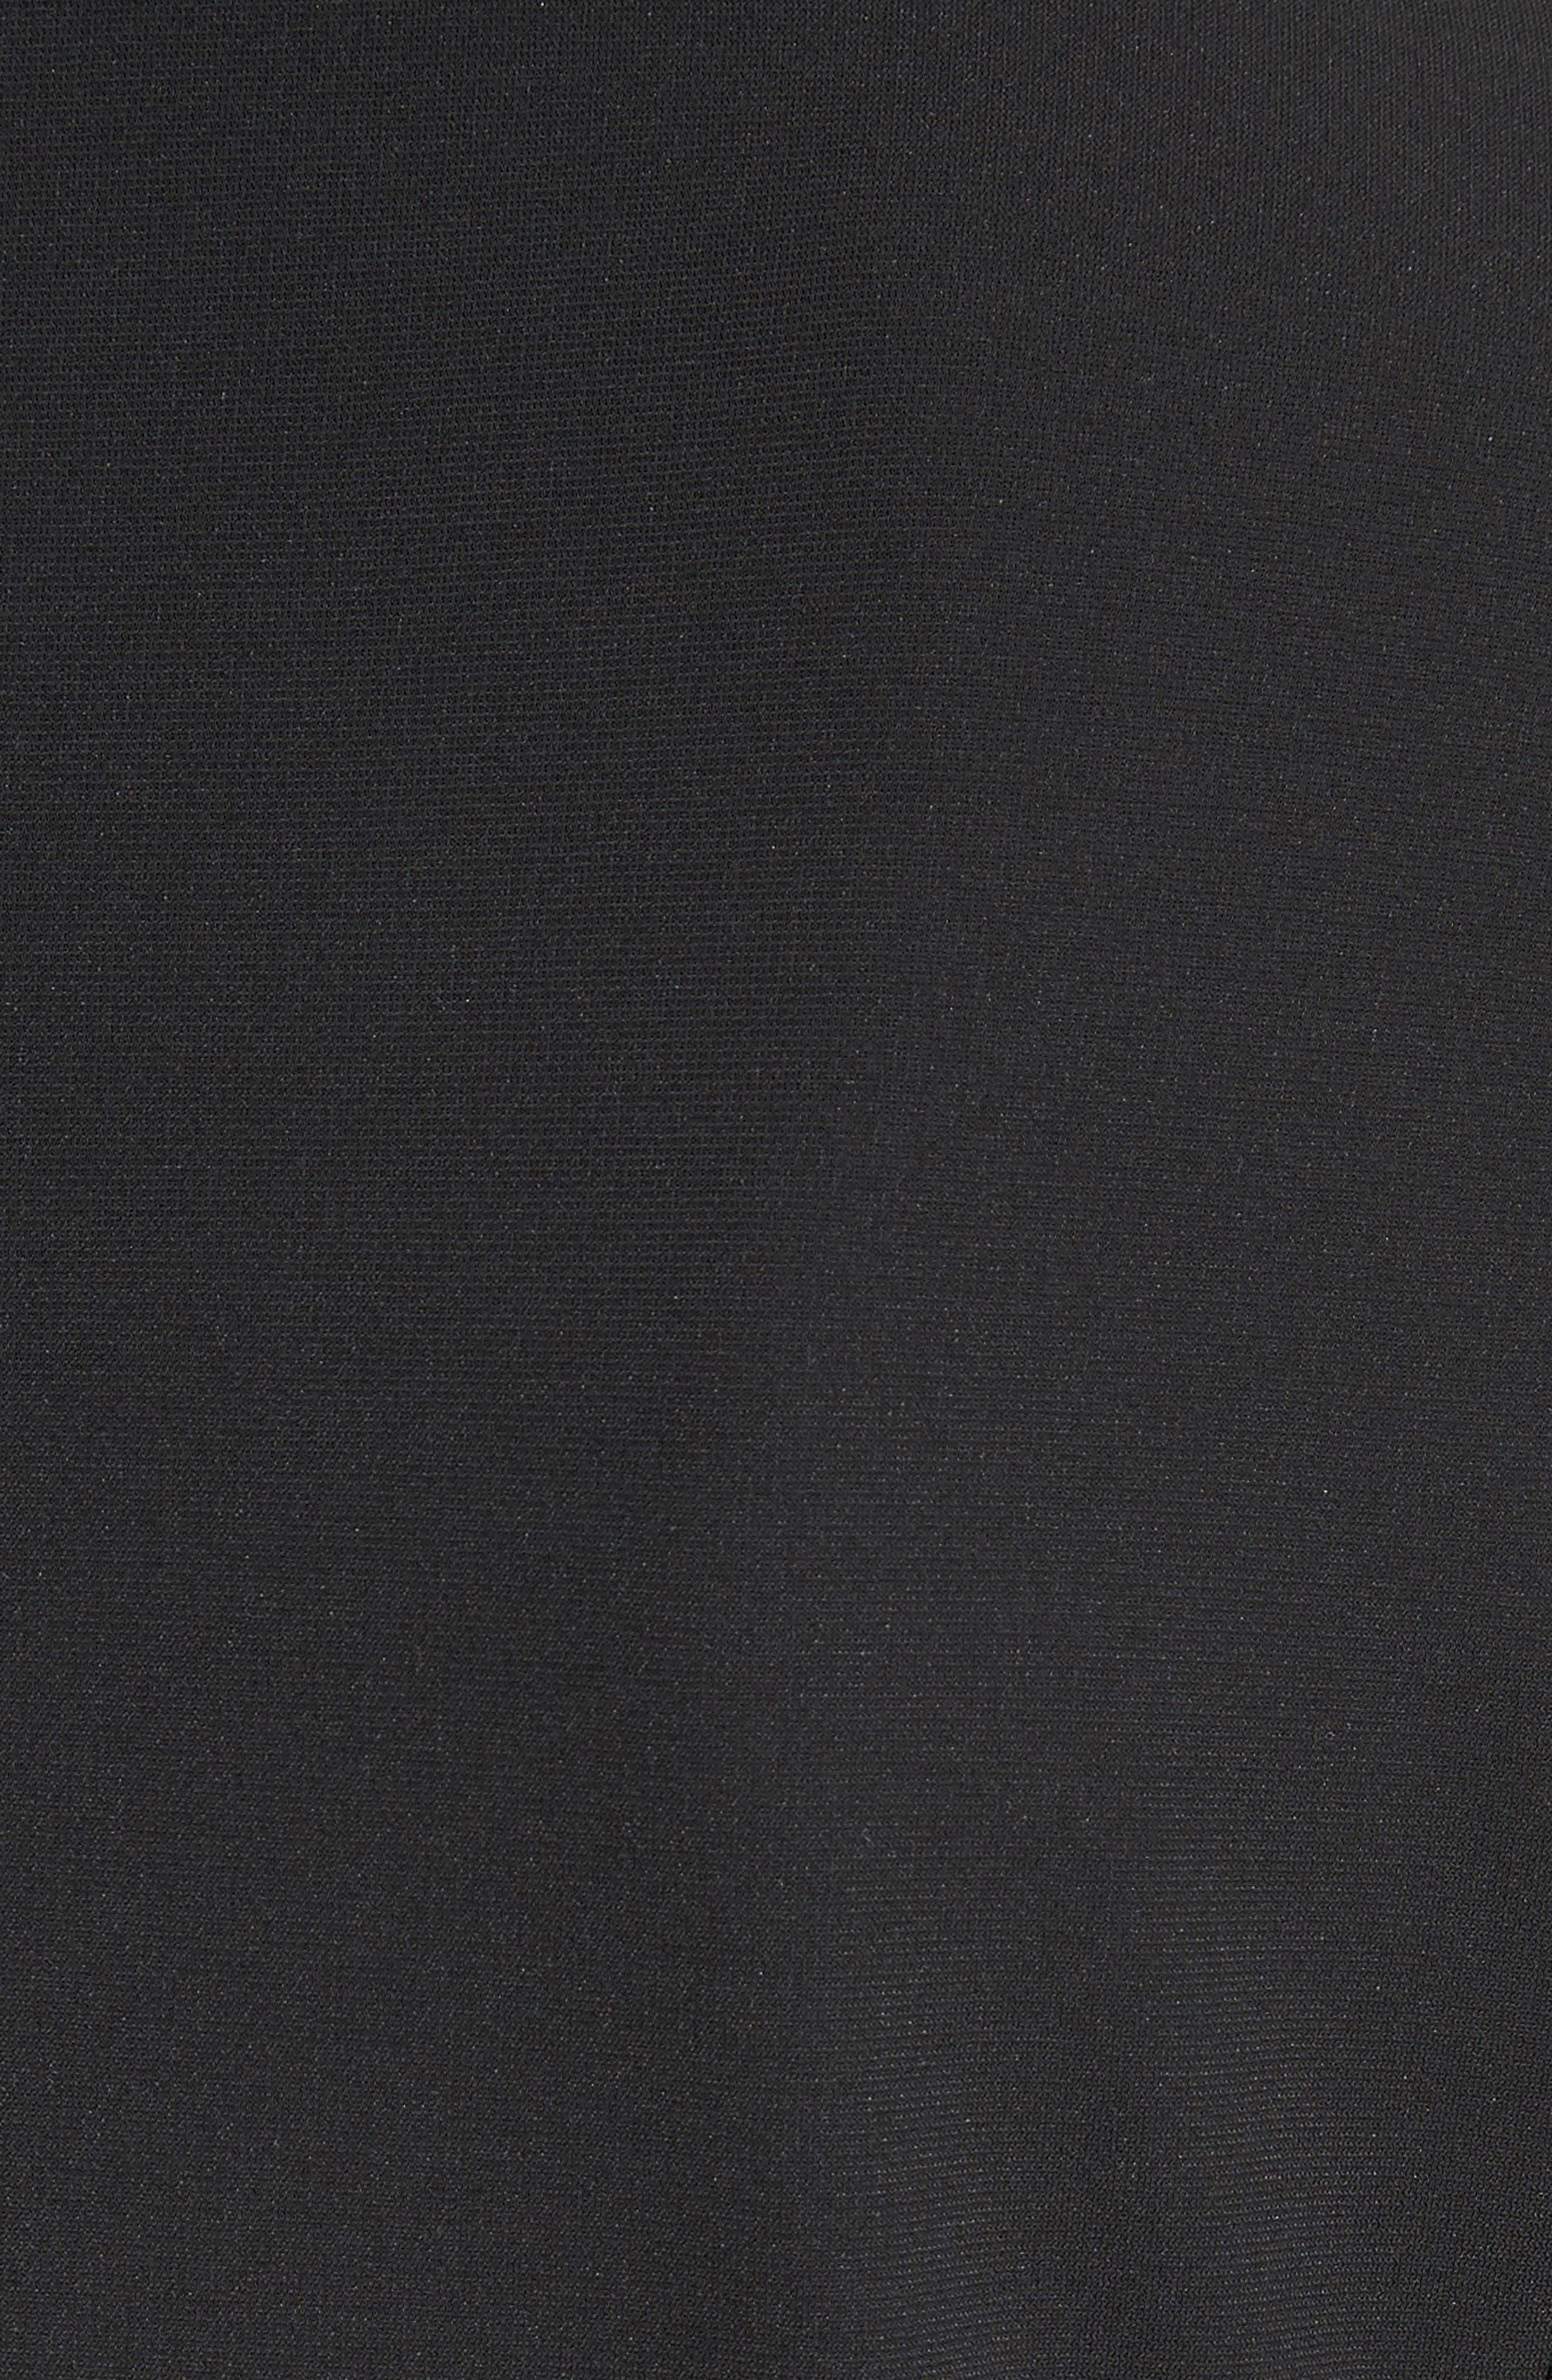 Bari Stretch Jersey Jacket,                             Alternate thumbnail 3, color,                             Black